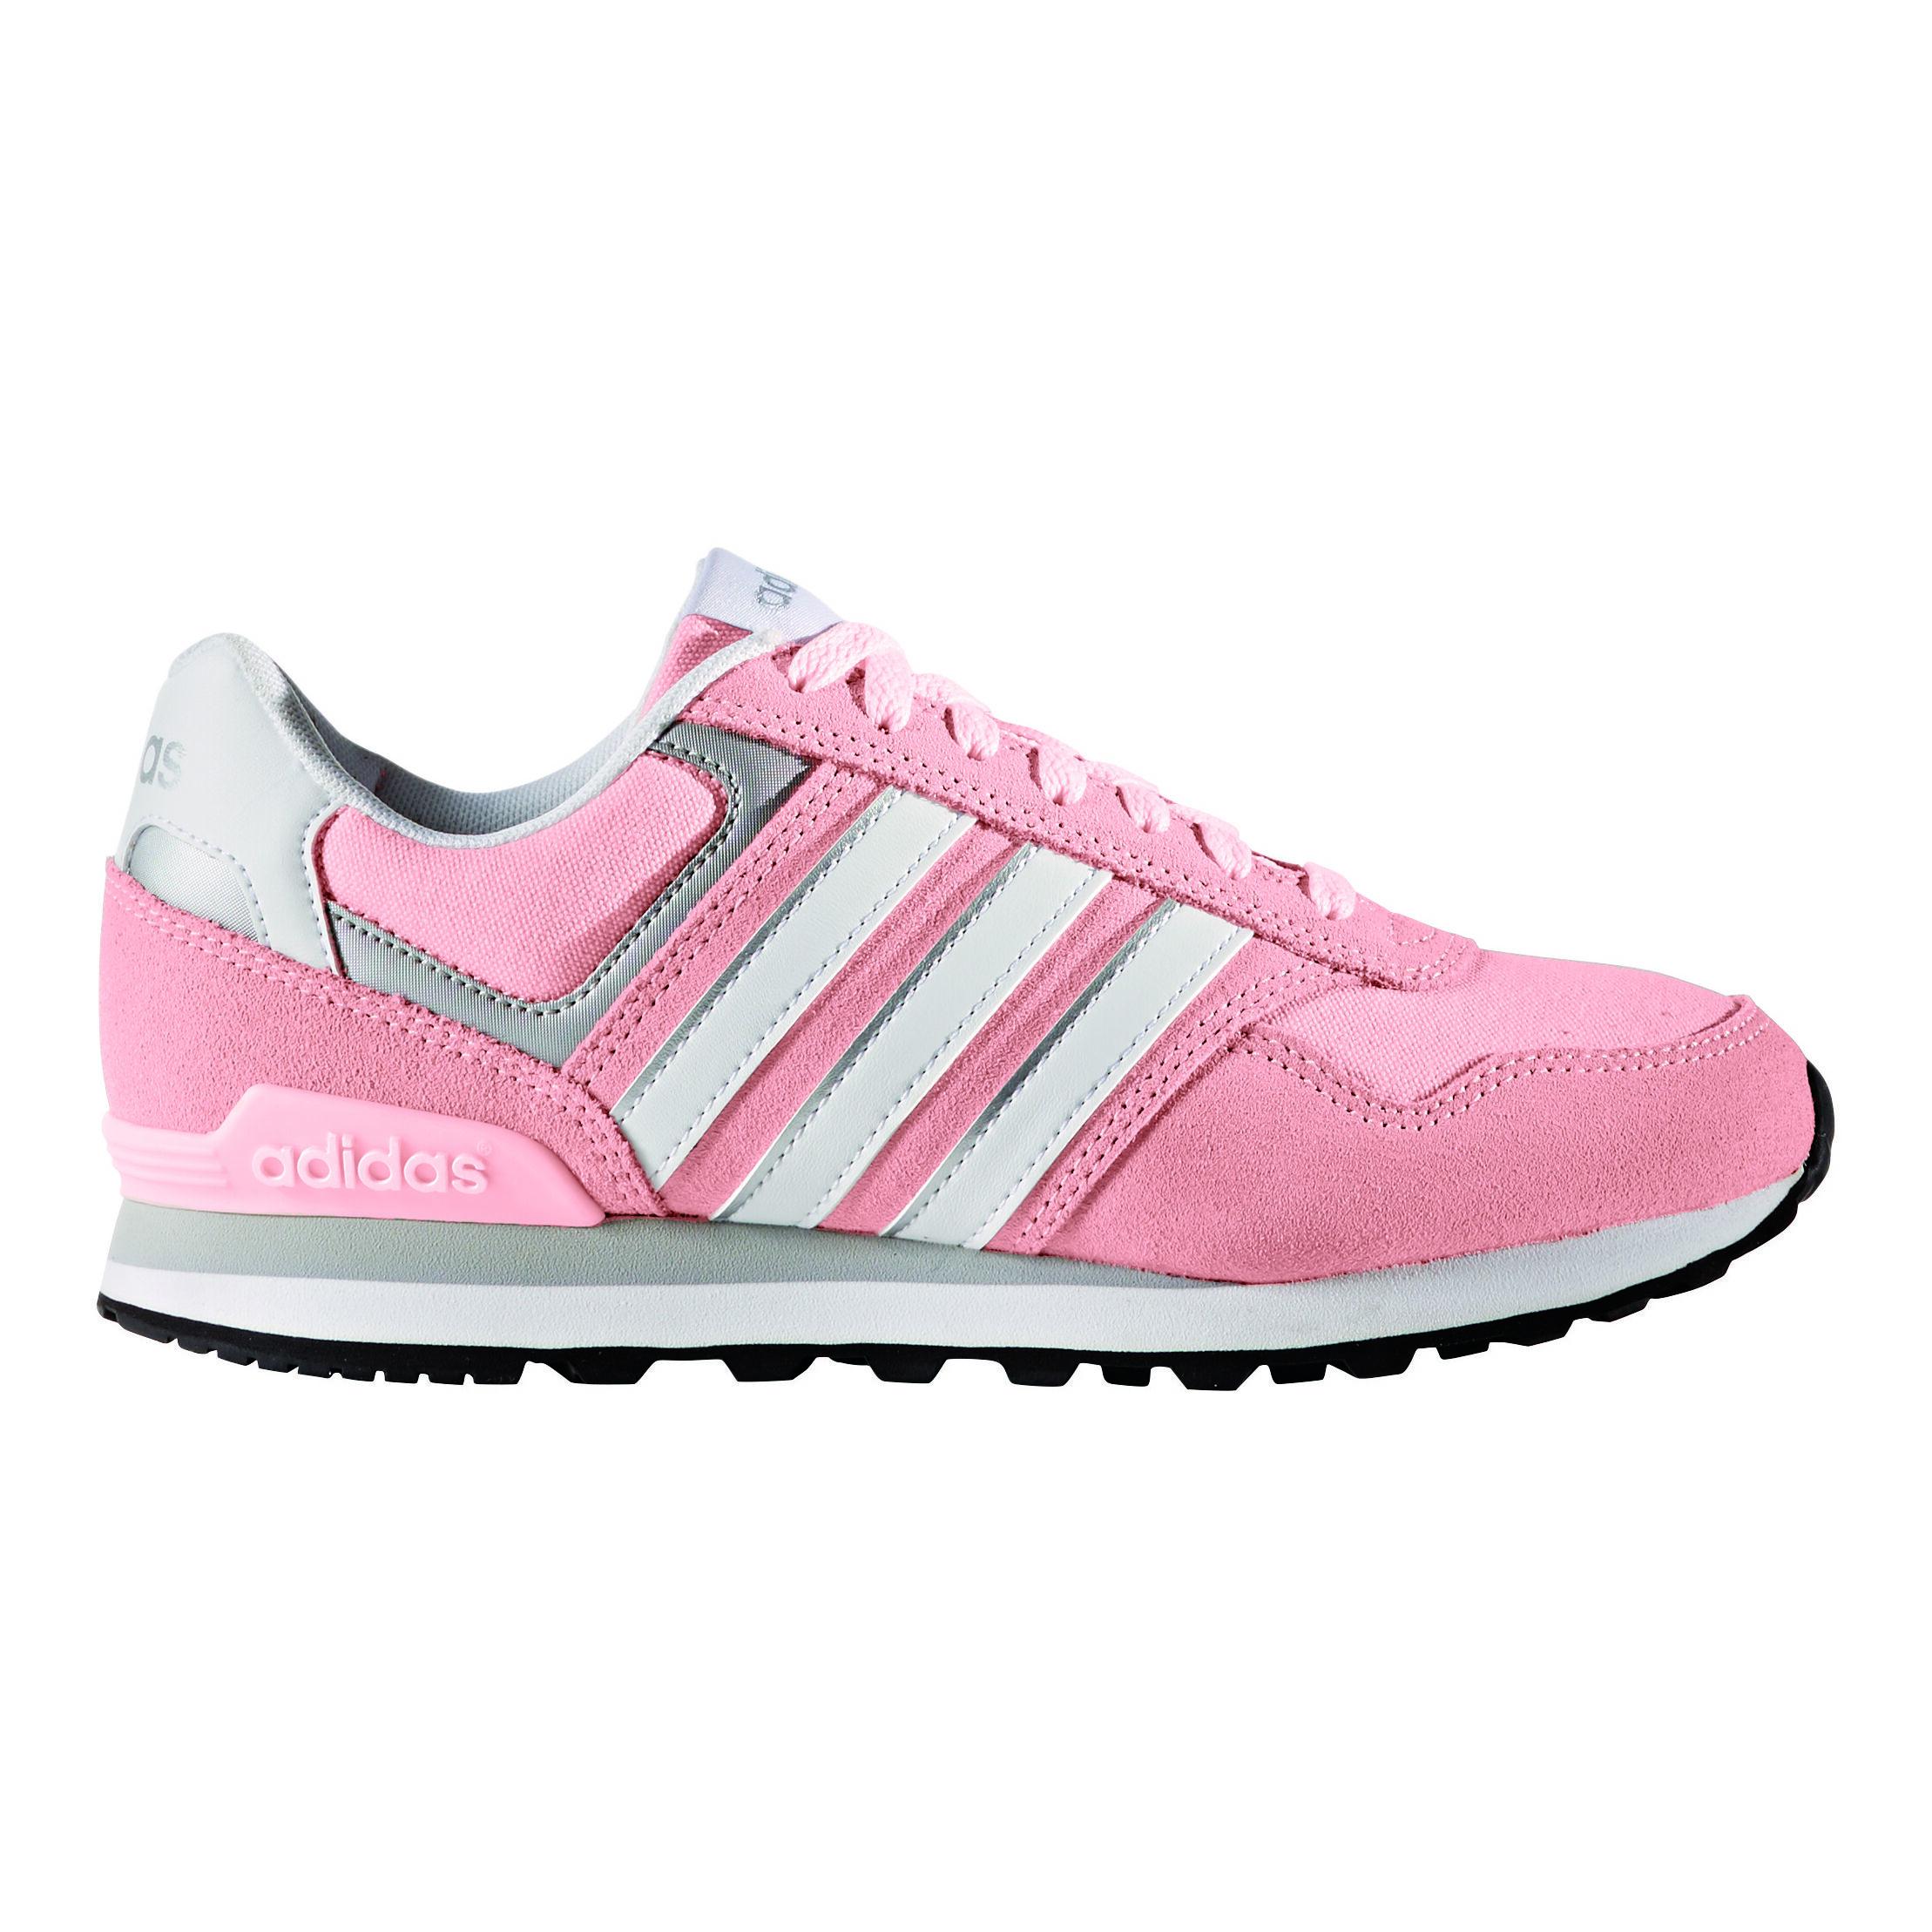 buy adidas NEO 10K Sneakers Women Pink, White online